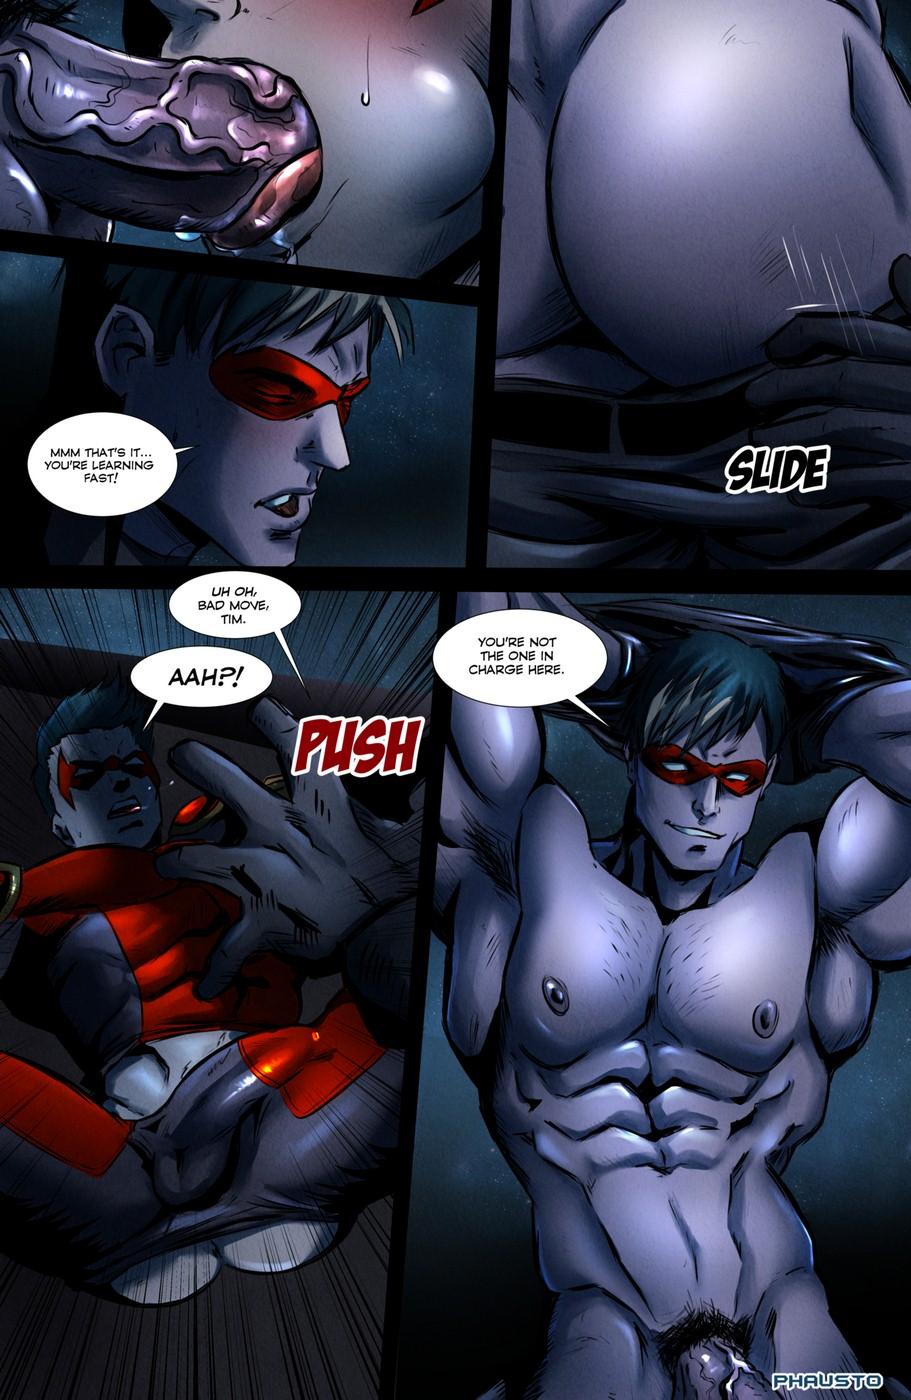 Batman Porno phausto- batboys - [batman], anal sex • free porn comics